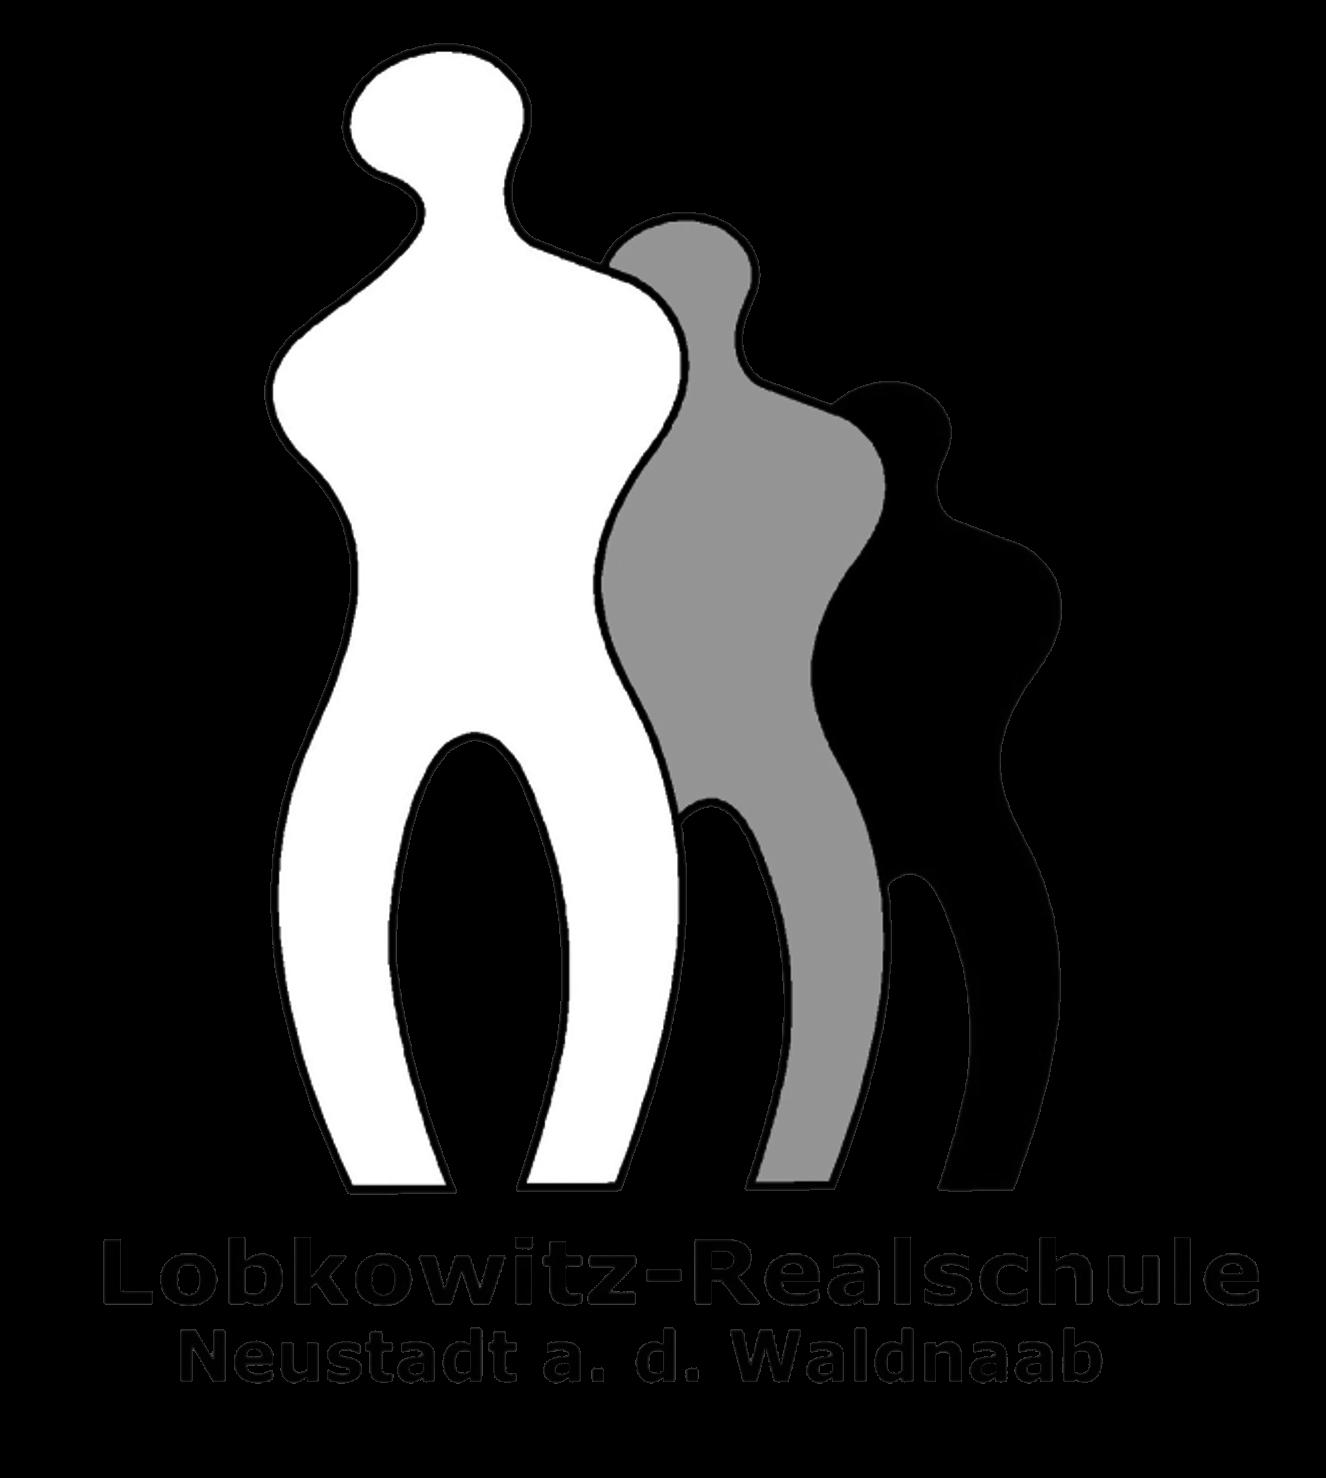 Lobkowitz Realschule Logo